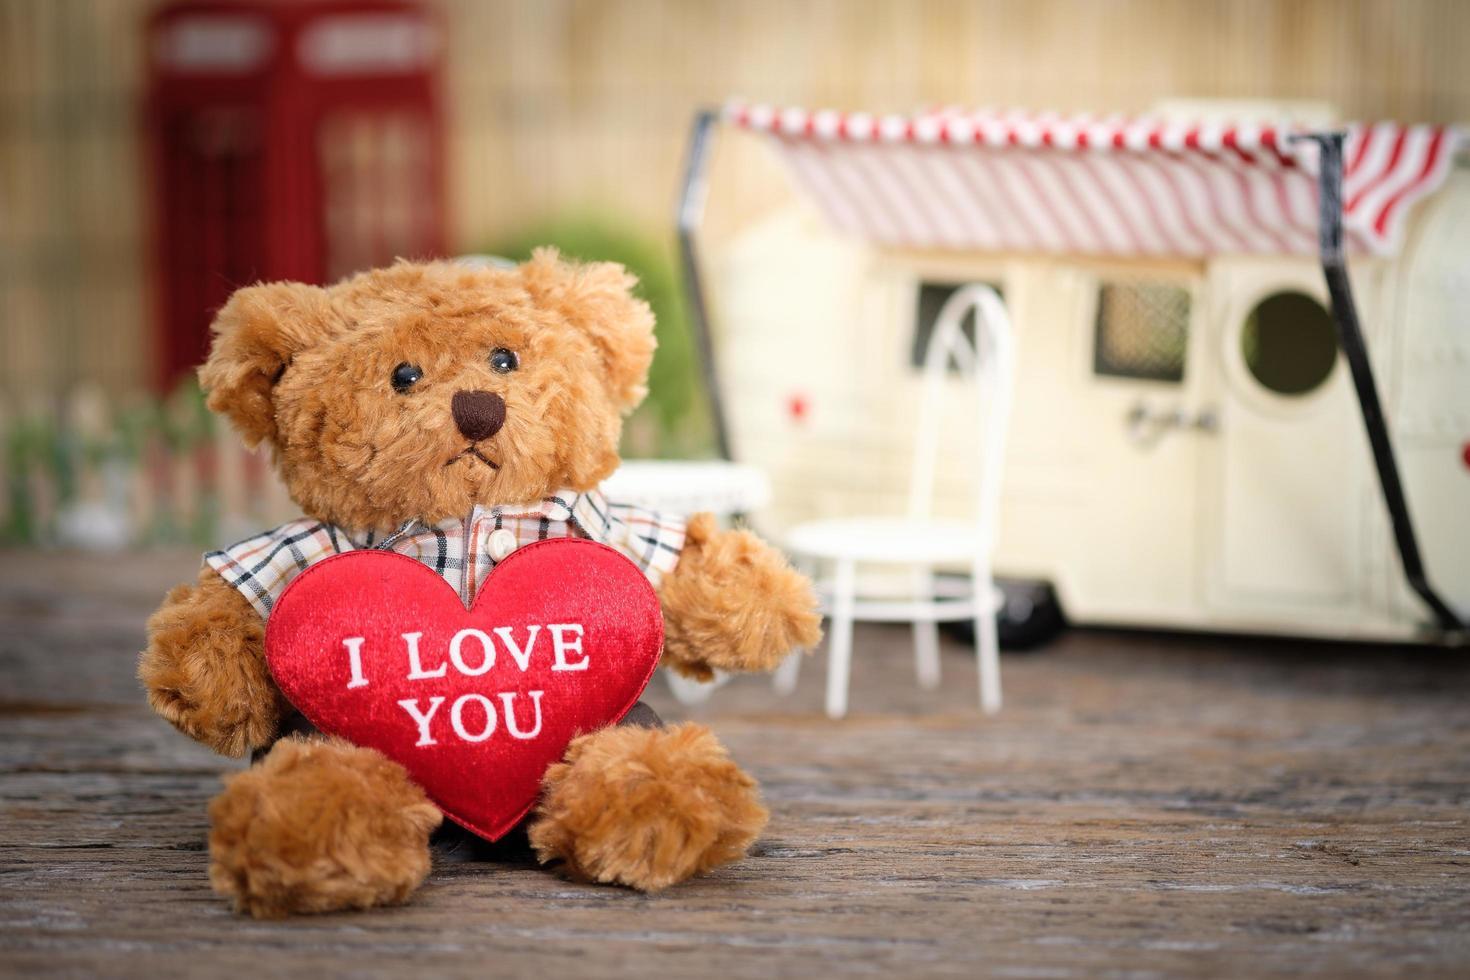 Teddy bear holding heart-shape pillow photo